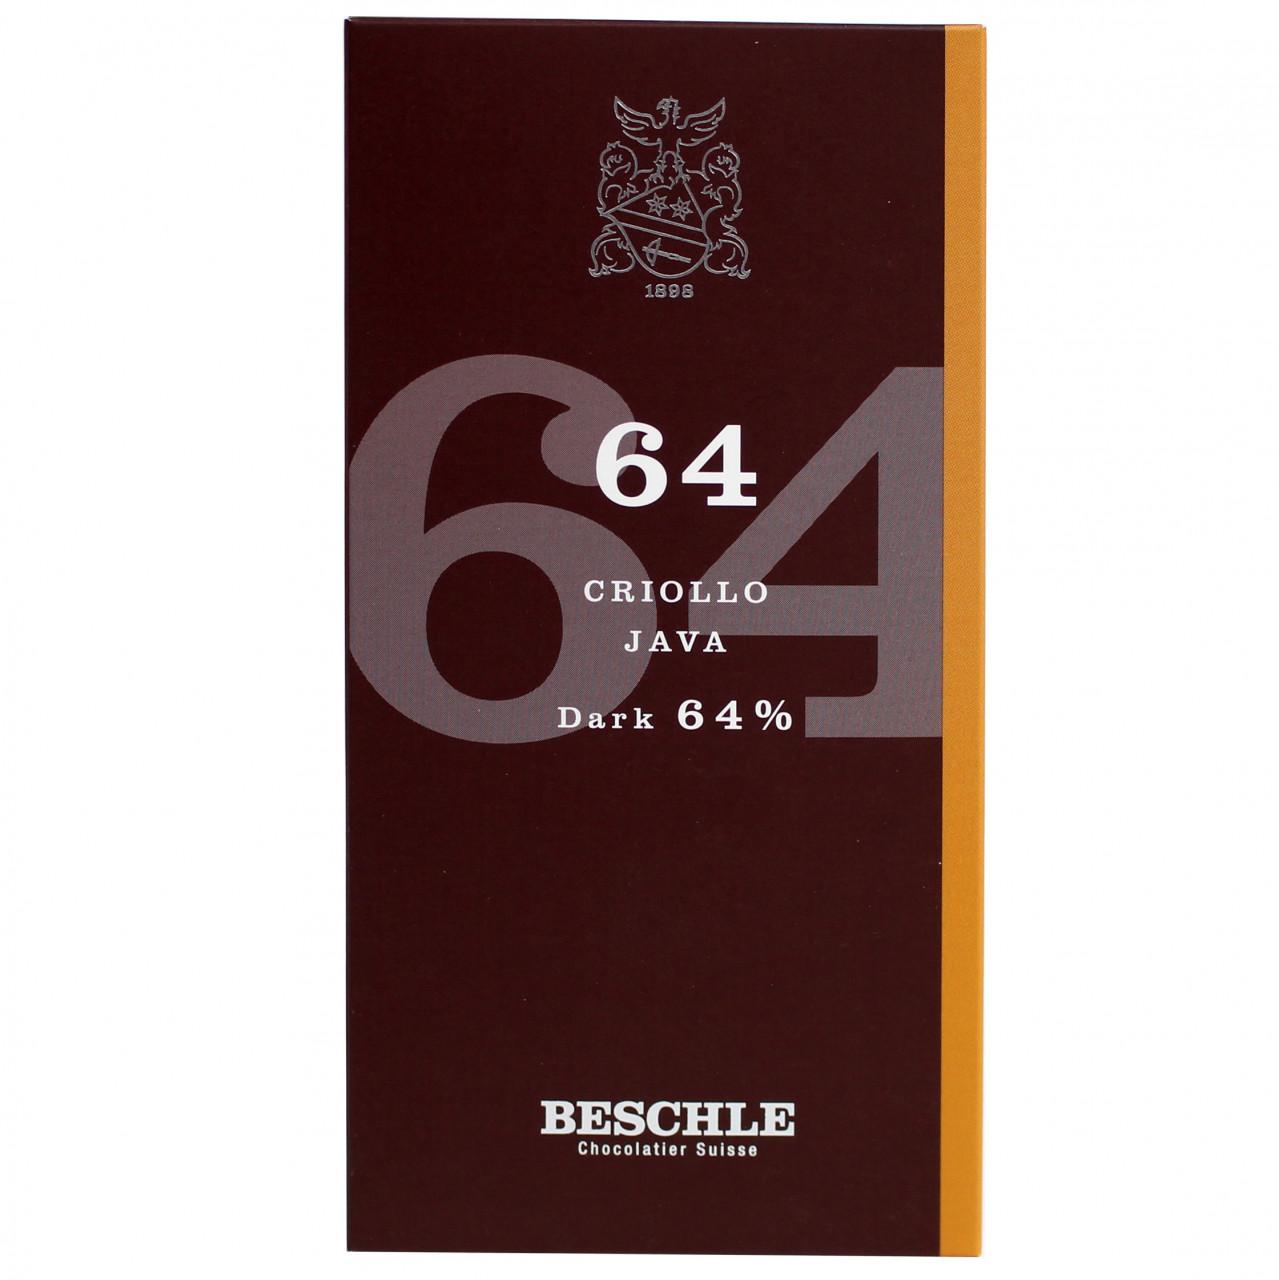 Beschle, Schweizer Schokolade, Grand Cru, Schokolade dunkel, Java, dark chocolate, chocolat noir, Criollo, Cocoa                                                                                         -  - Chocolats-De-Luxe